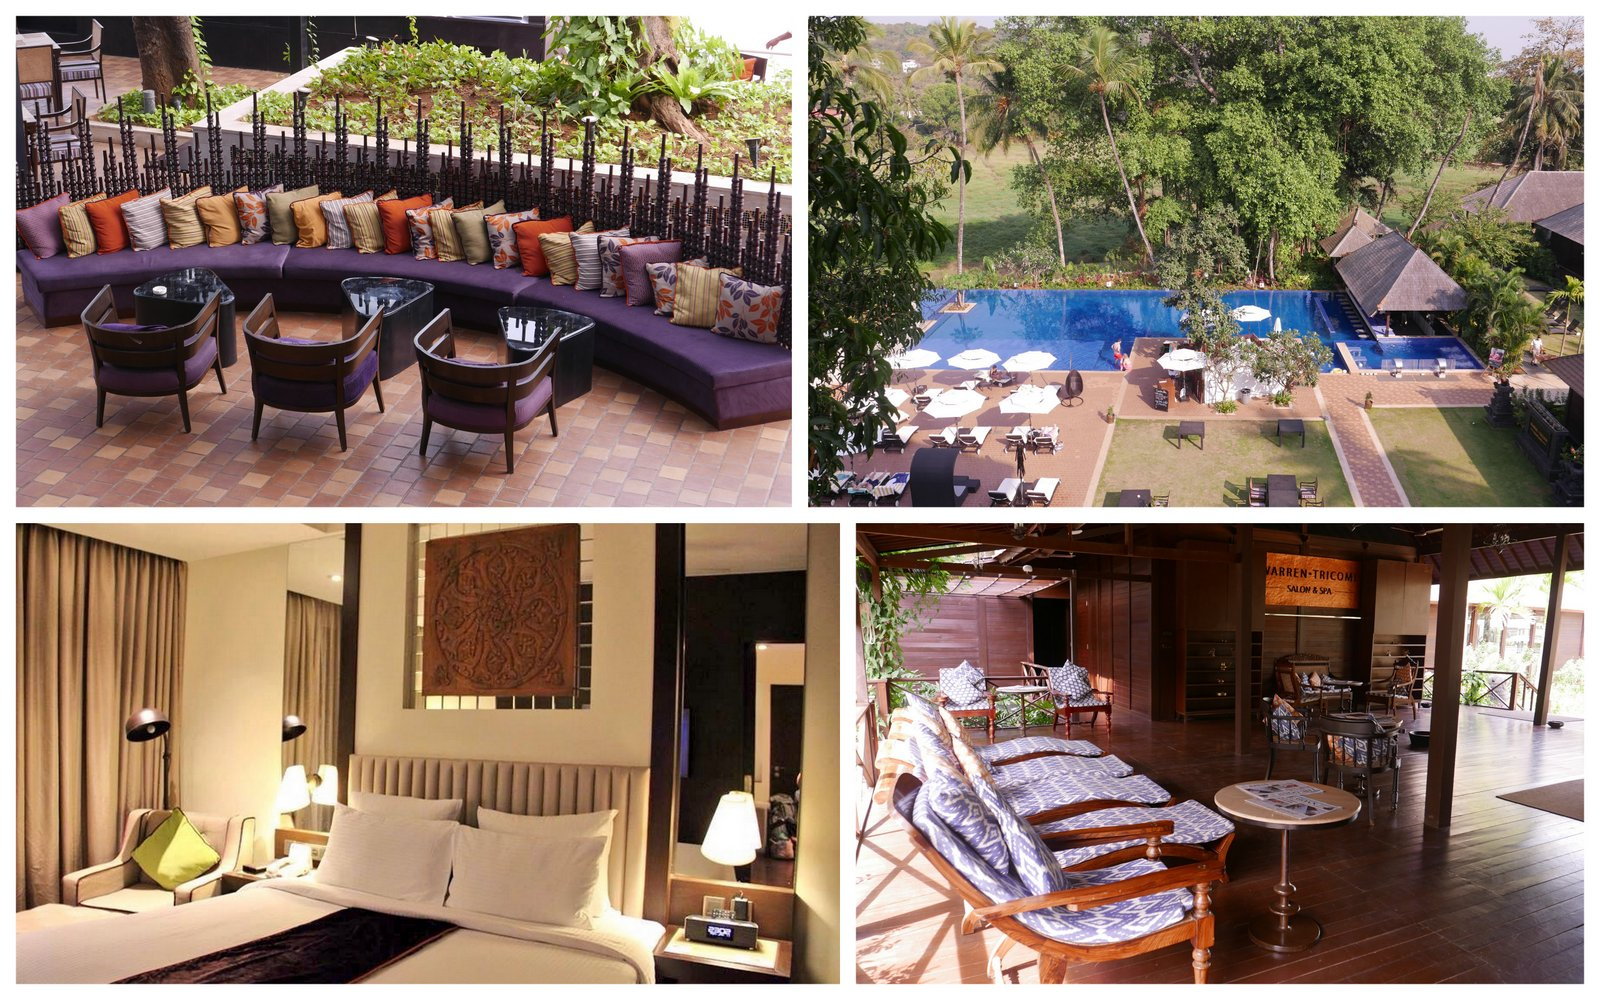 Le Novotel Goa Shrem Resort à Candolim